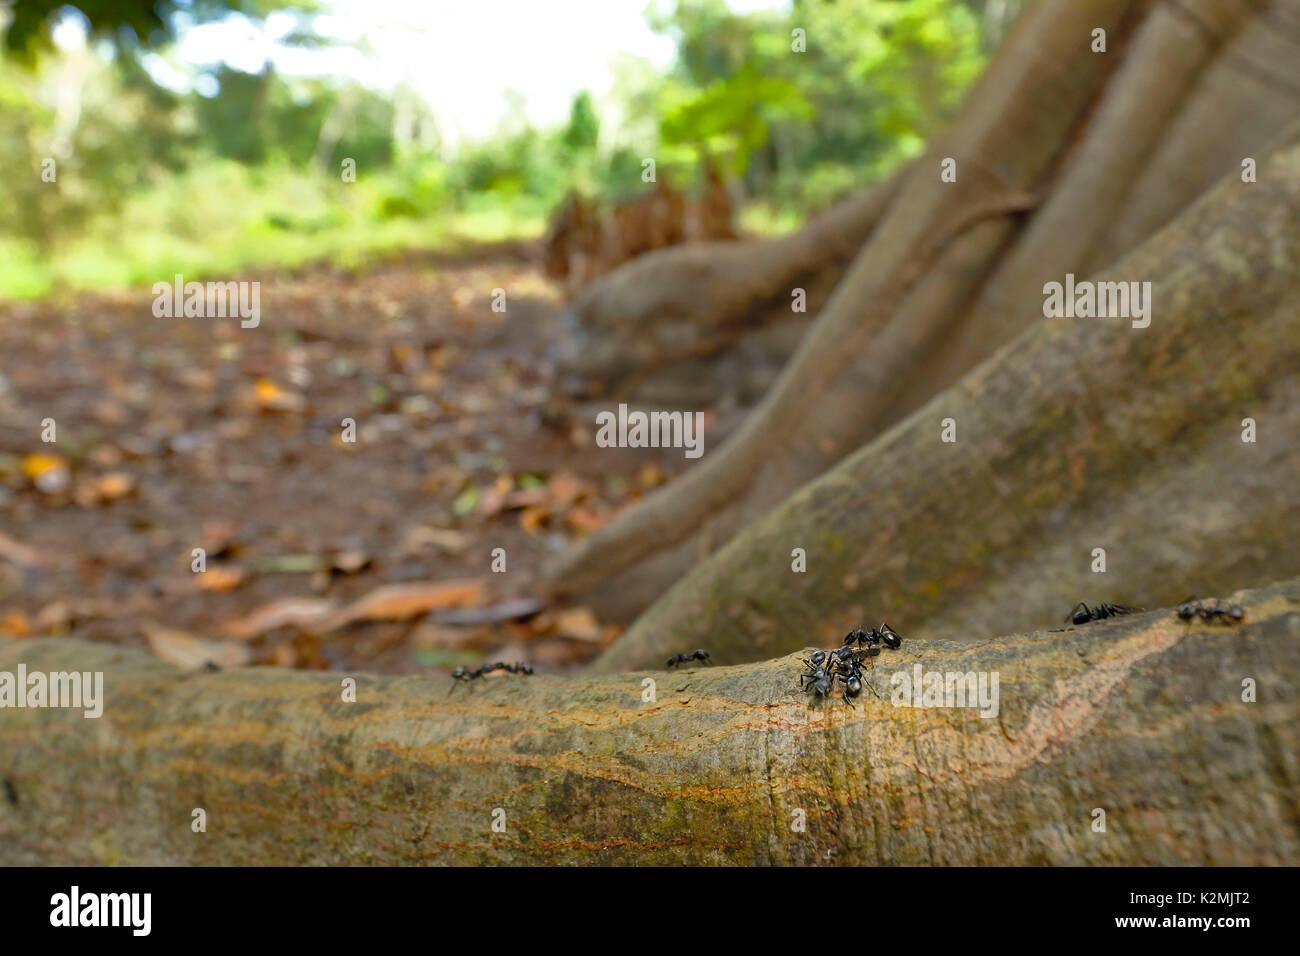 Bullet ant (Paraponera clavata), walking on tree roots Stock Photo